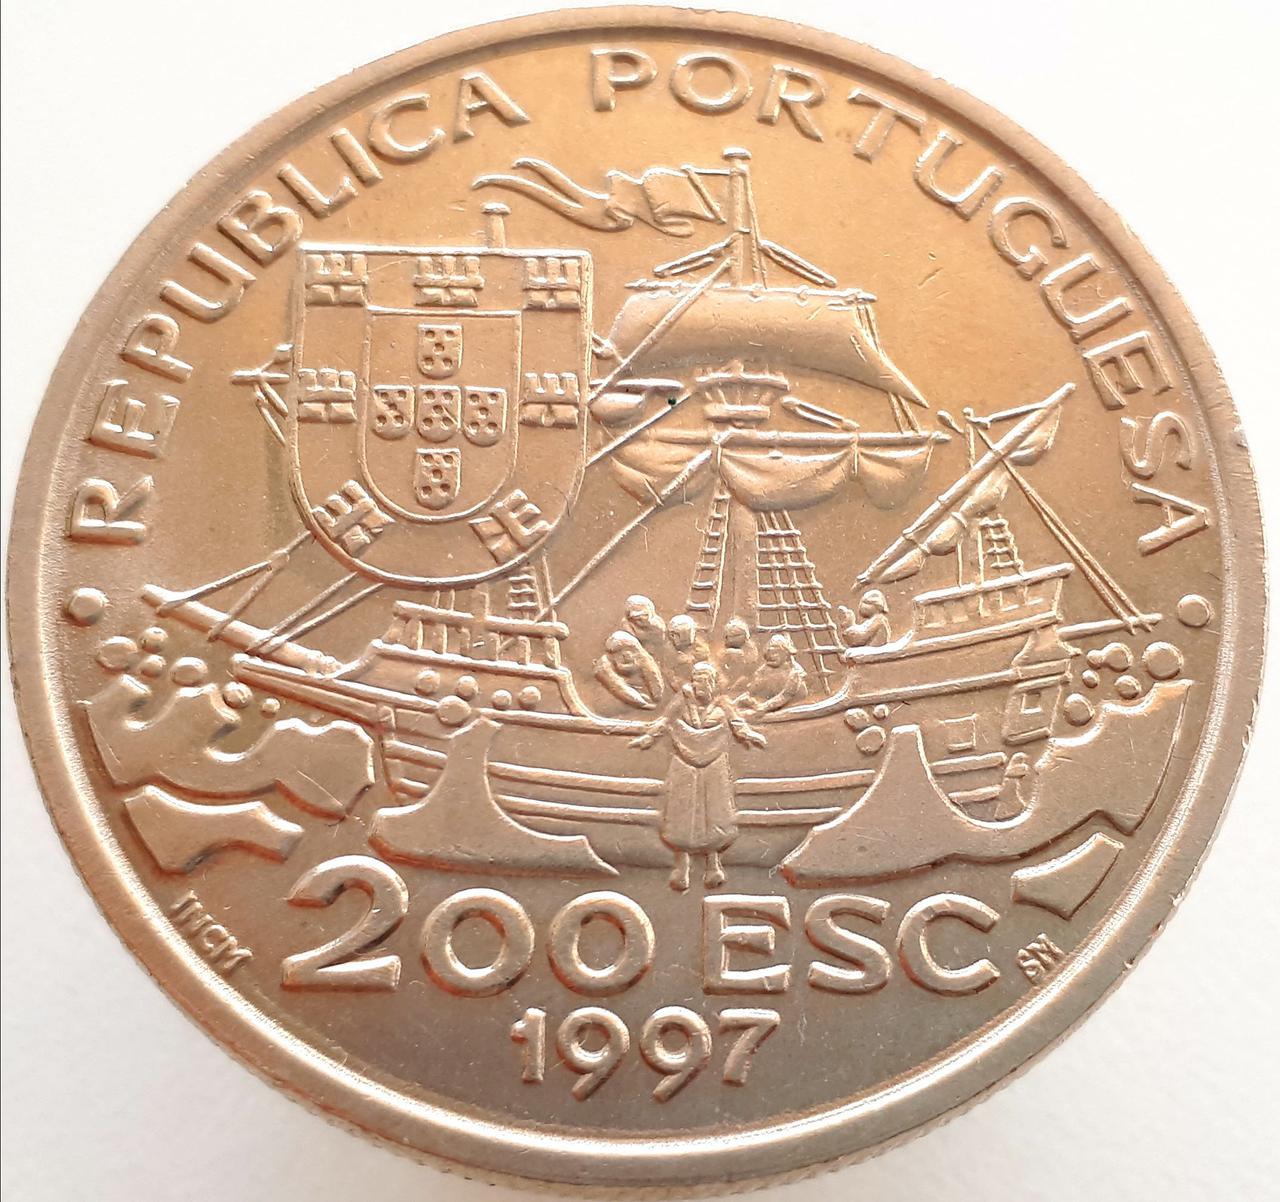 Португалия 200 эскудо 1997 - 445 лет со дня смерти святого Франциска Ксаверия